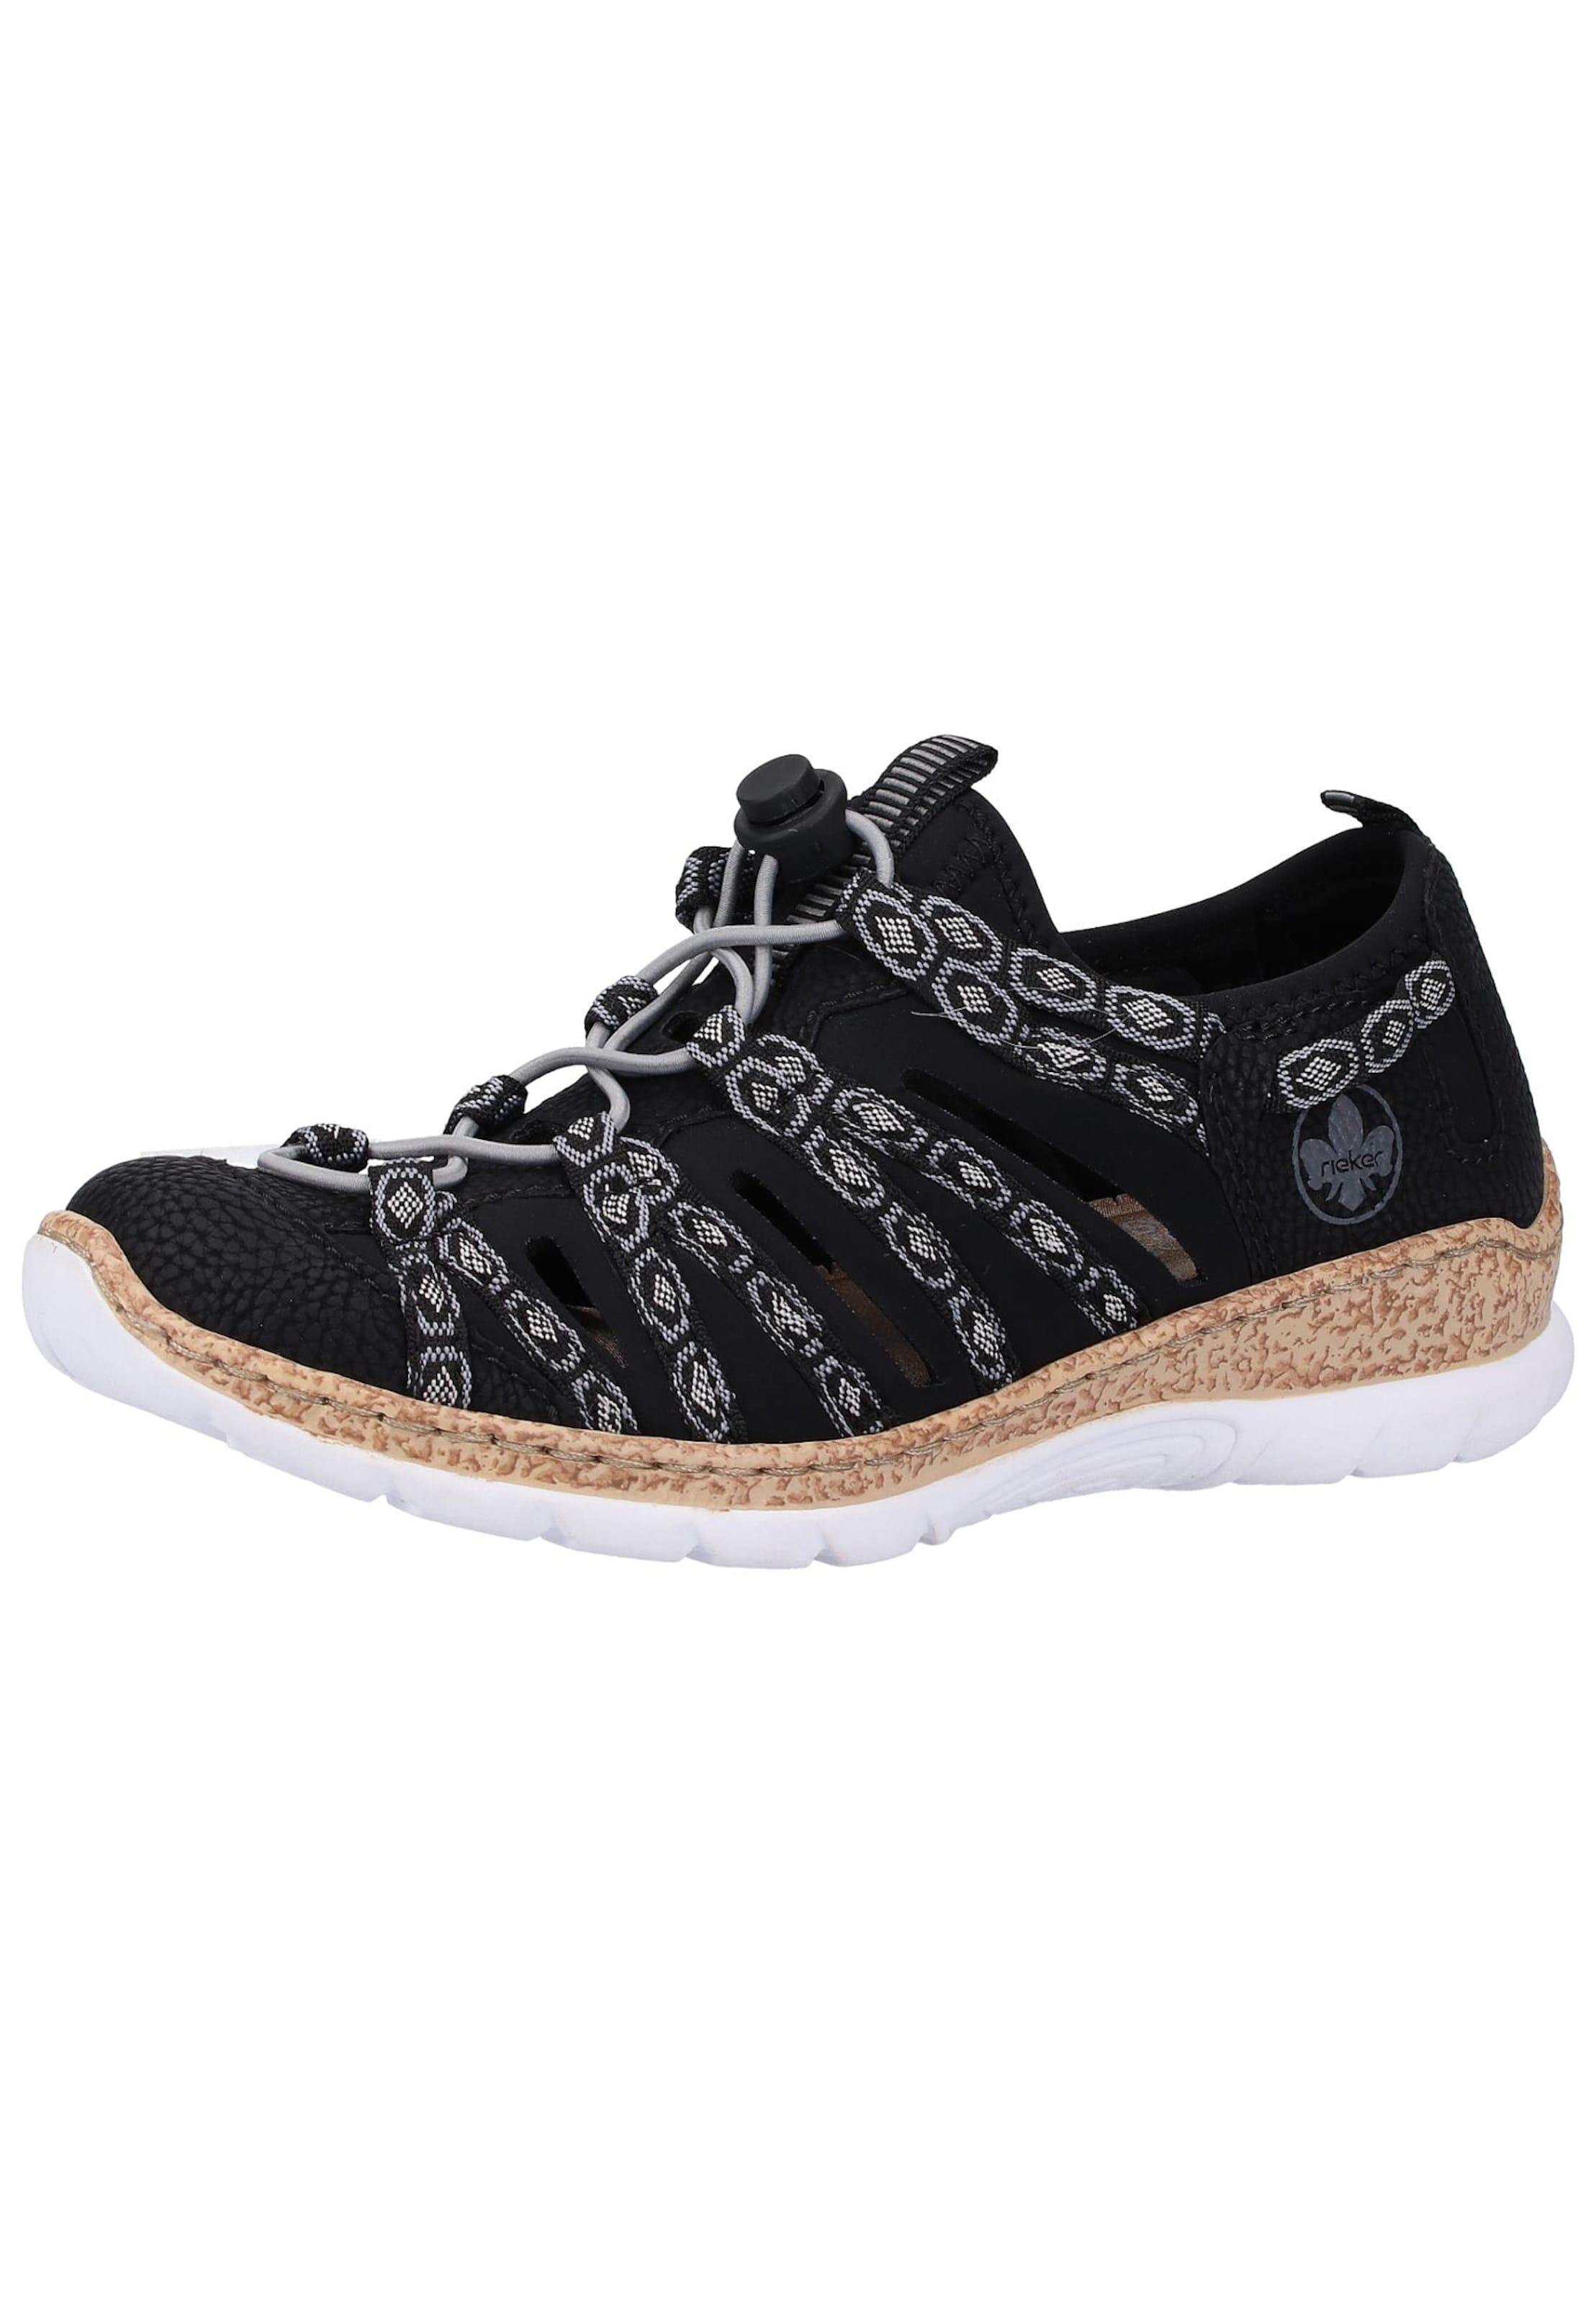 get cheap cheap for discount 100% top quality RIEKER Halbschuhe in weiß schwarz cc8c0vpth31638-Schuhe ...